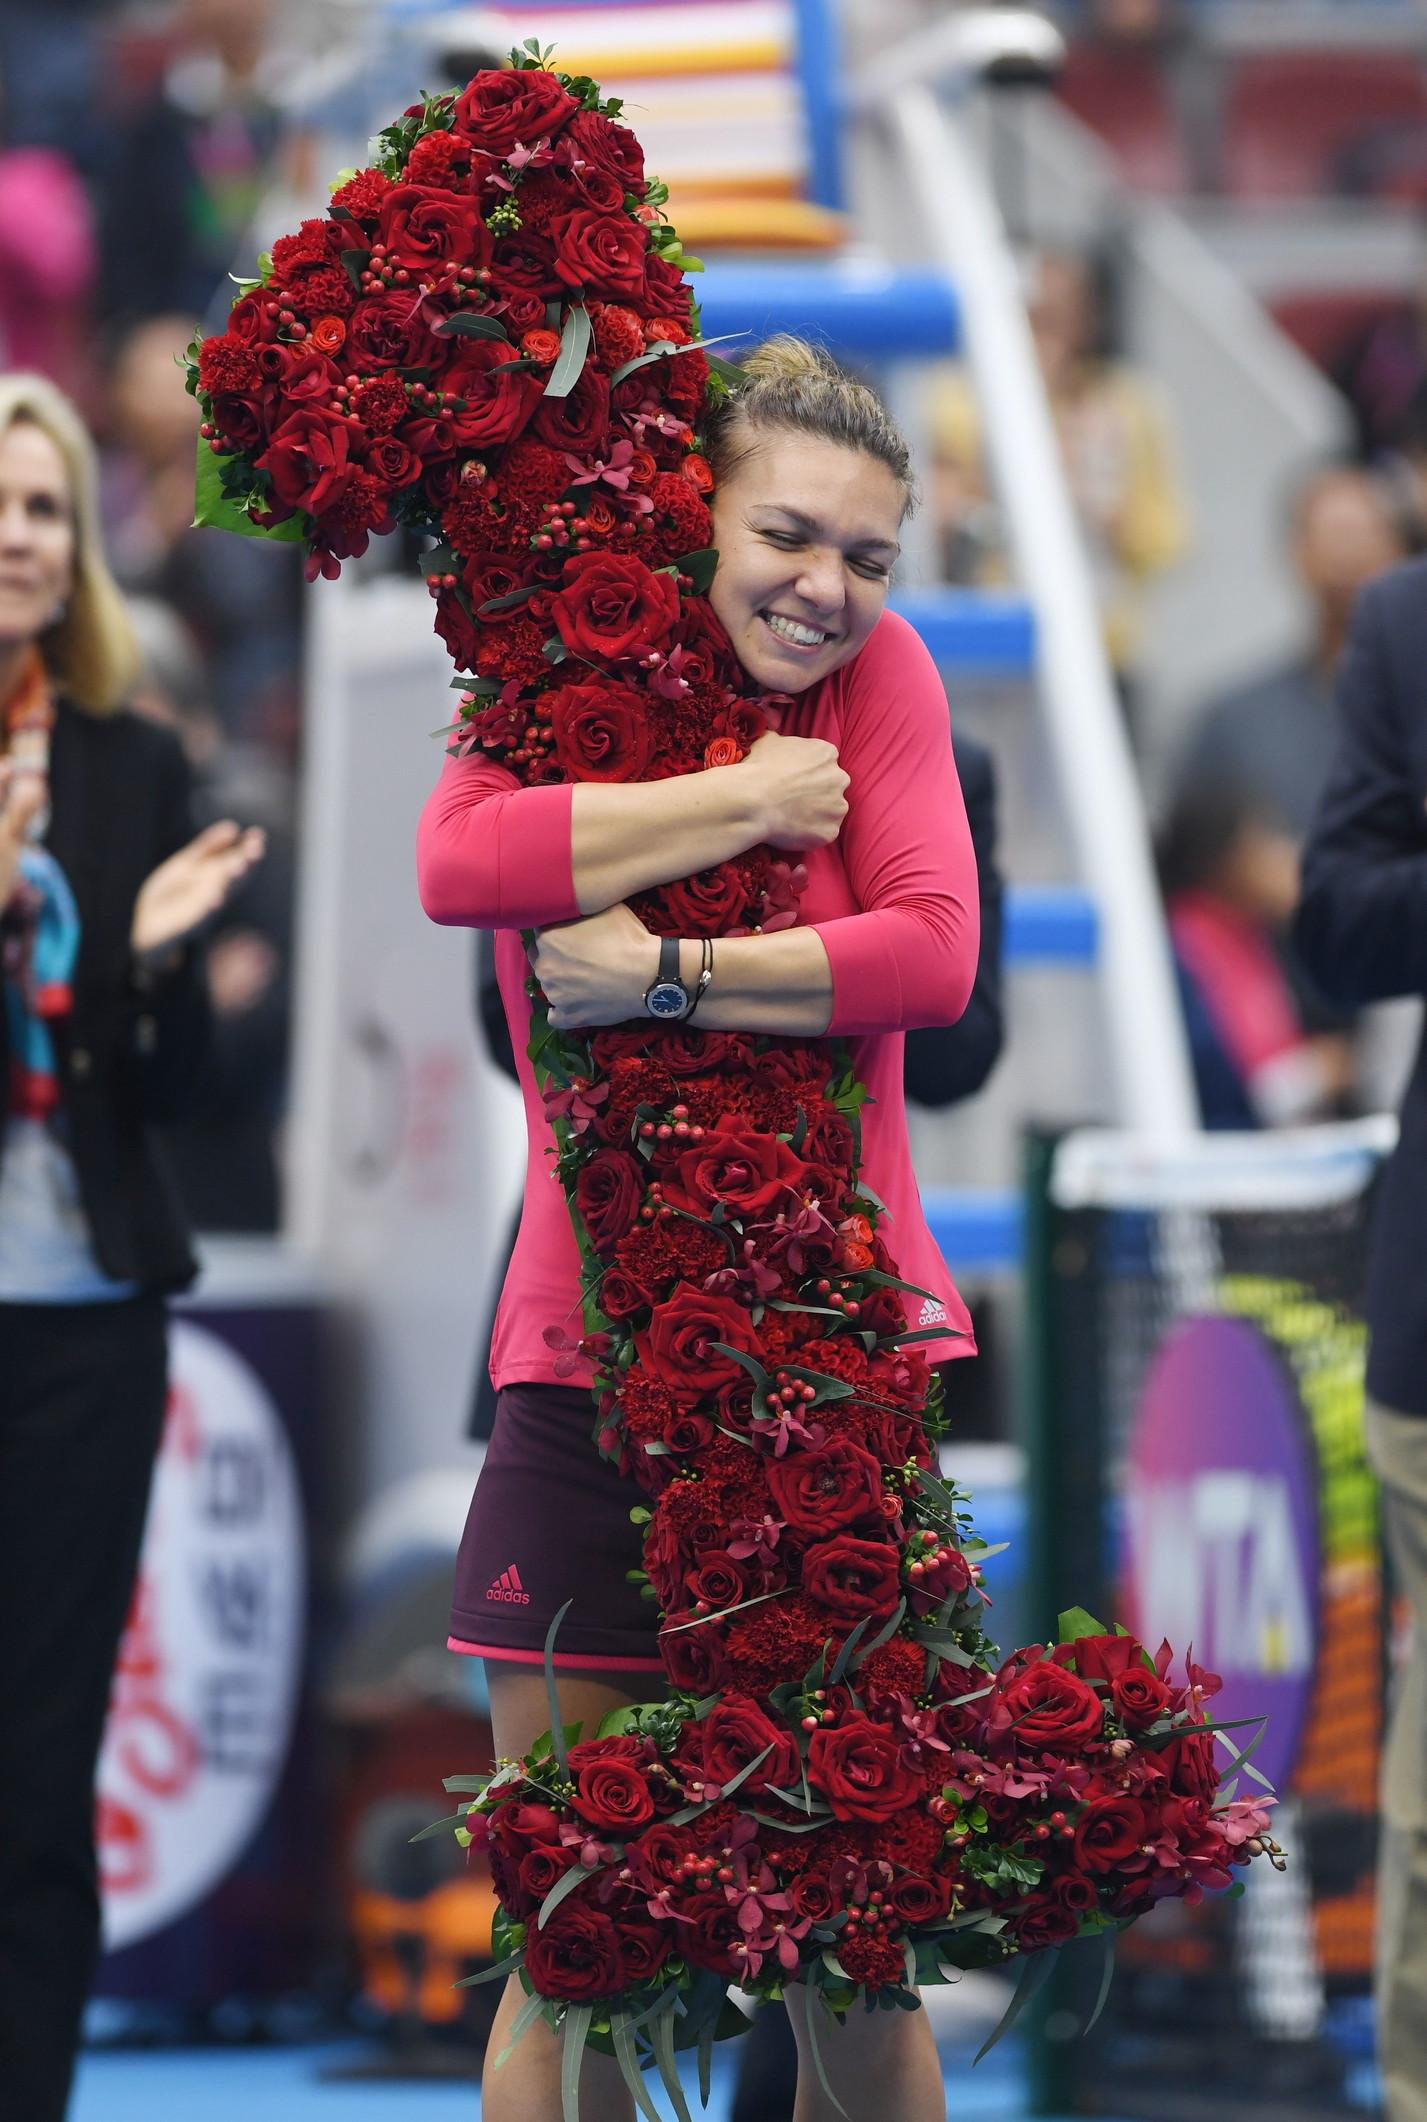 7 ottobre 2017: Simona Halep diventa numero 1 WTA